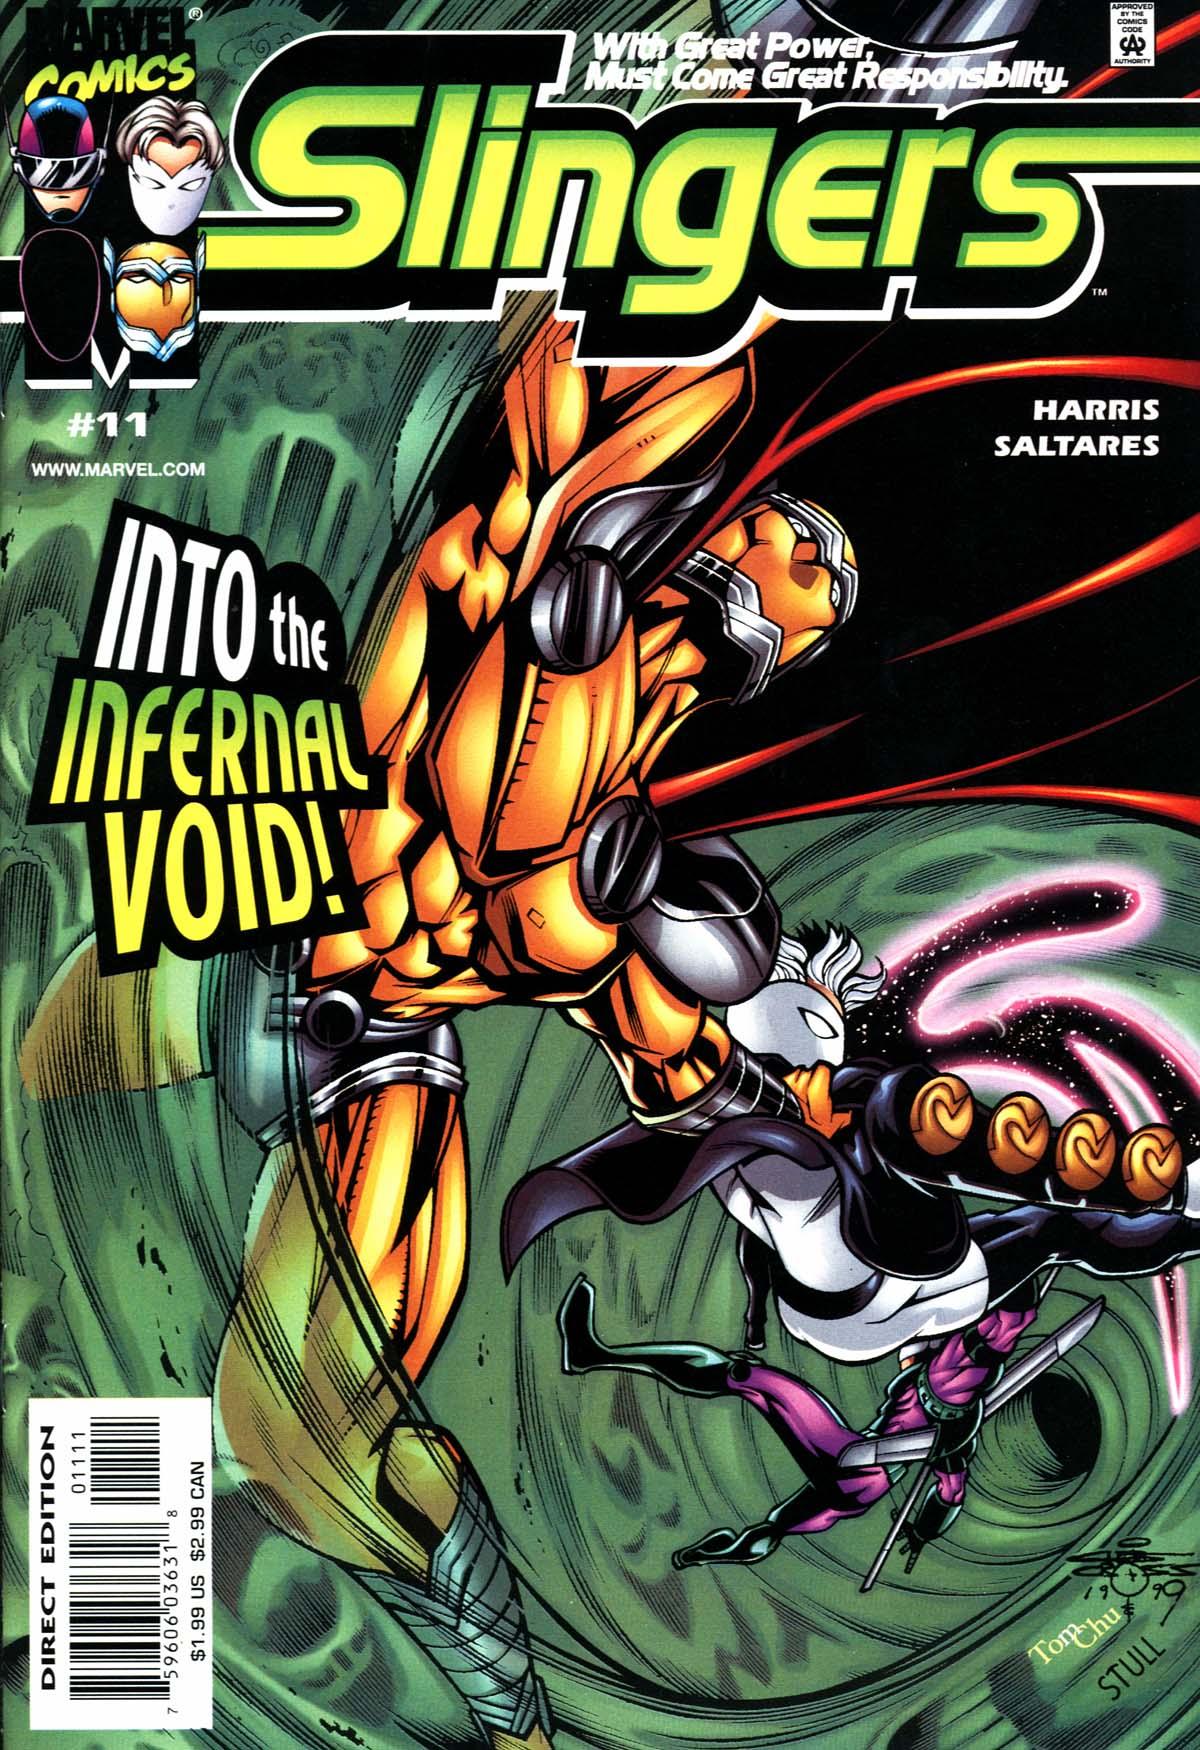 Read online Slingers comic -  Issue #11 - 1